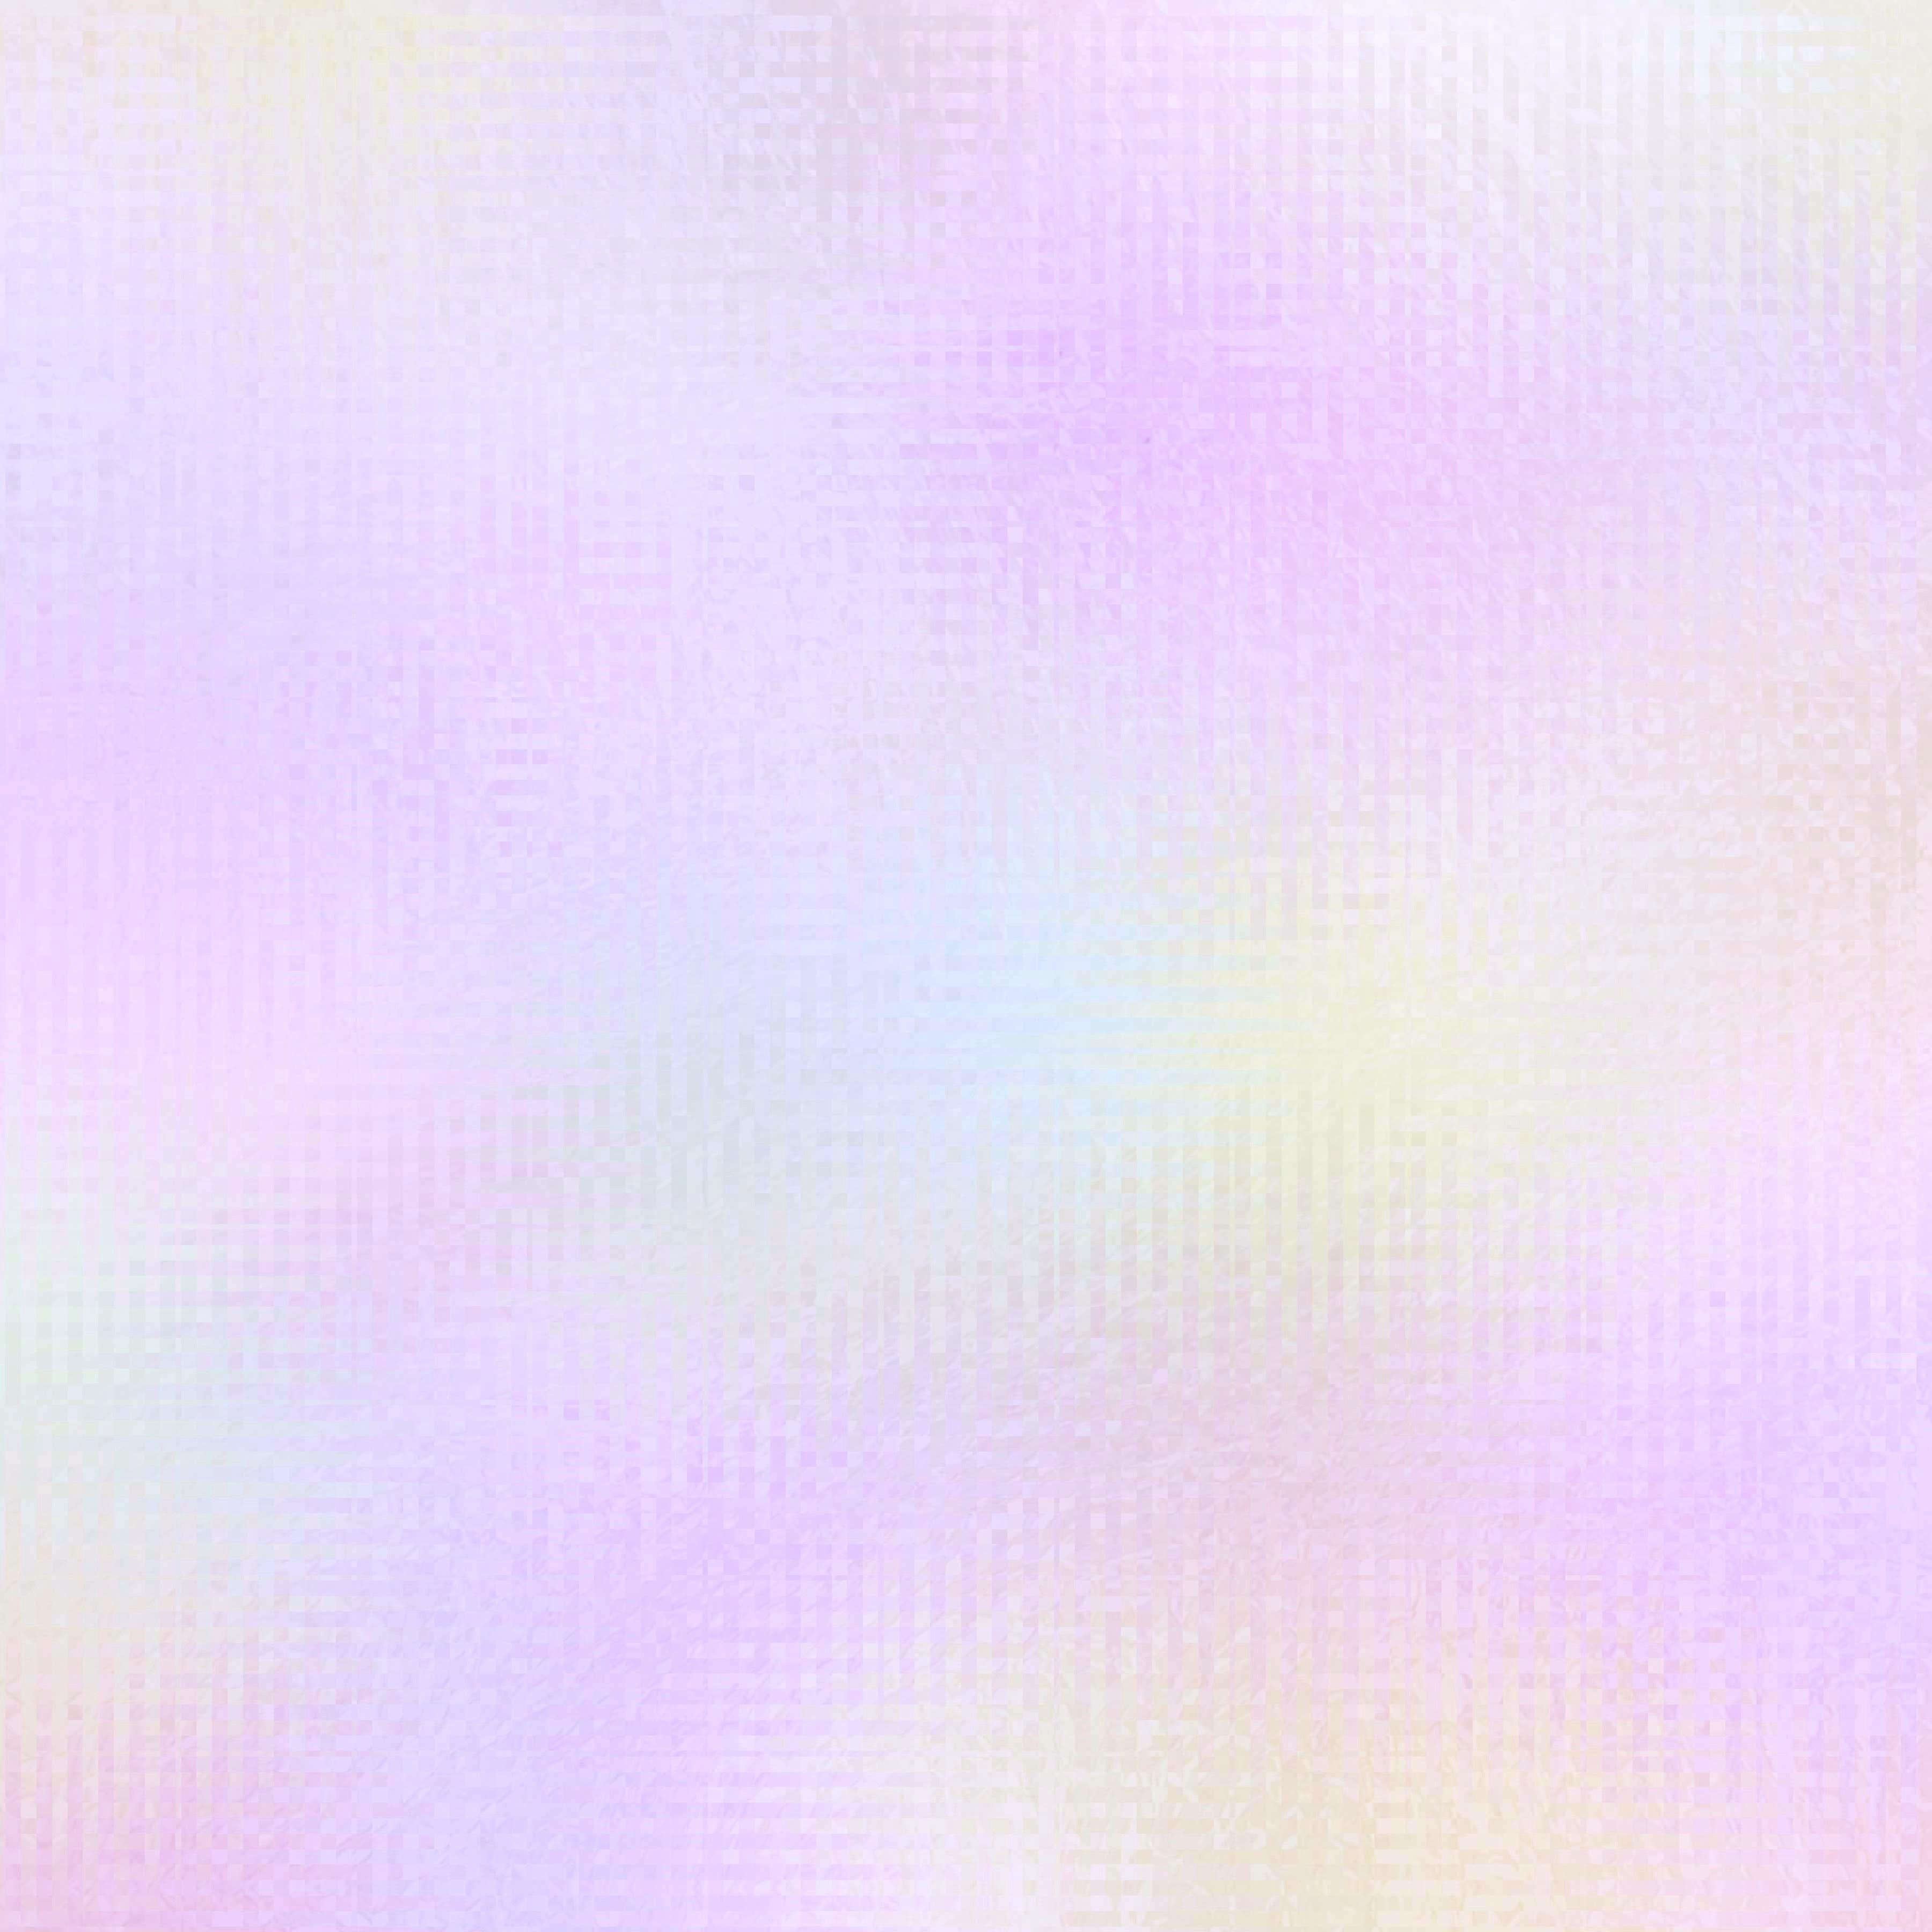 Download Pastel Colored Wallpaper JPG